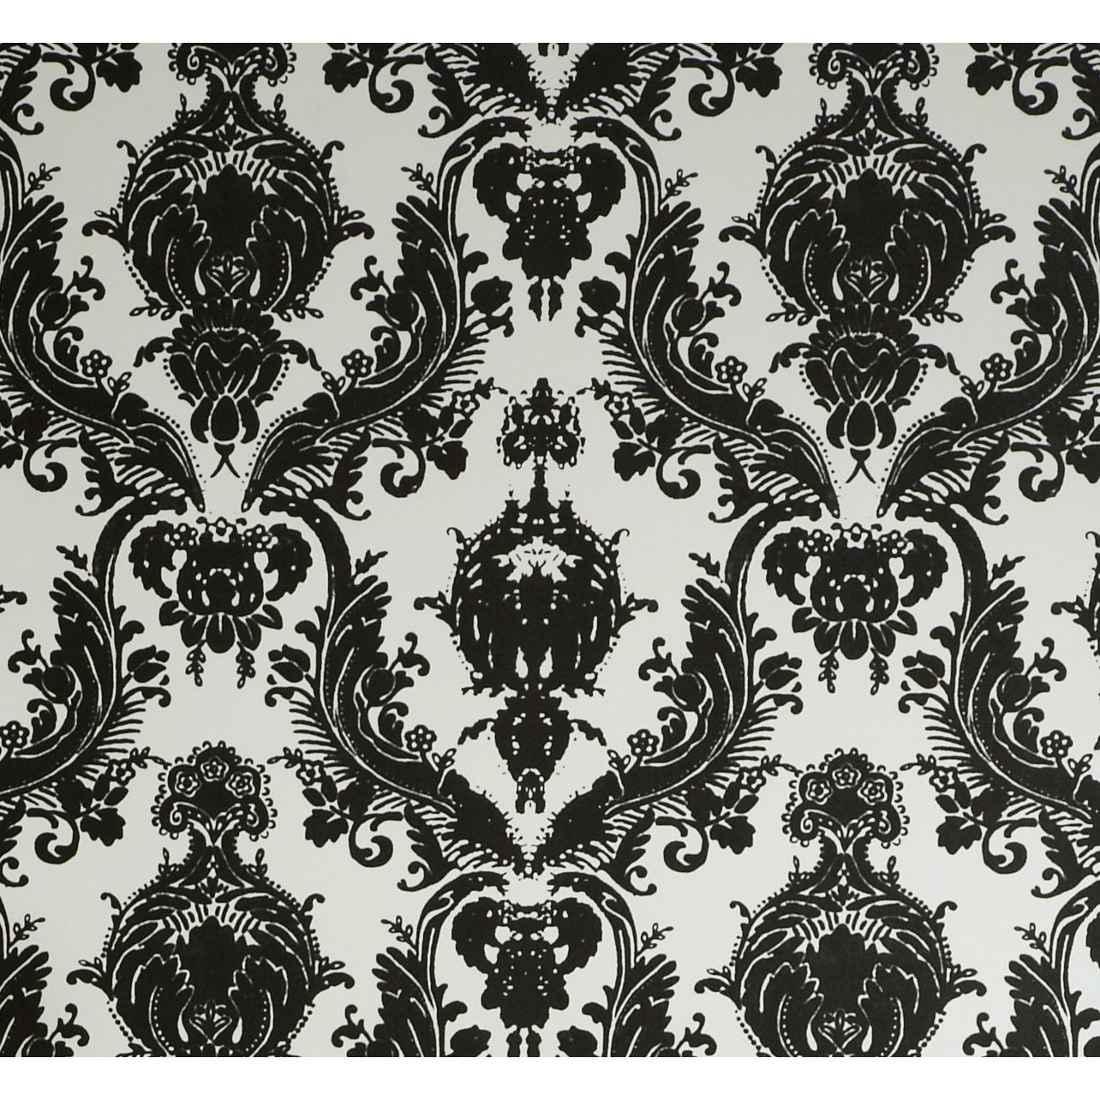 Designs Damsel Self Adhesive Black and White Temporary Wallpaper 1100x1100